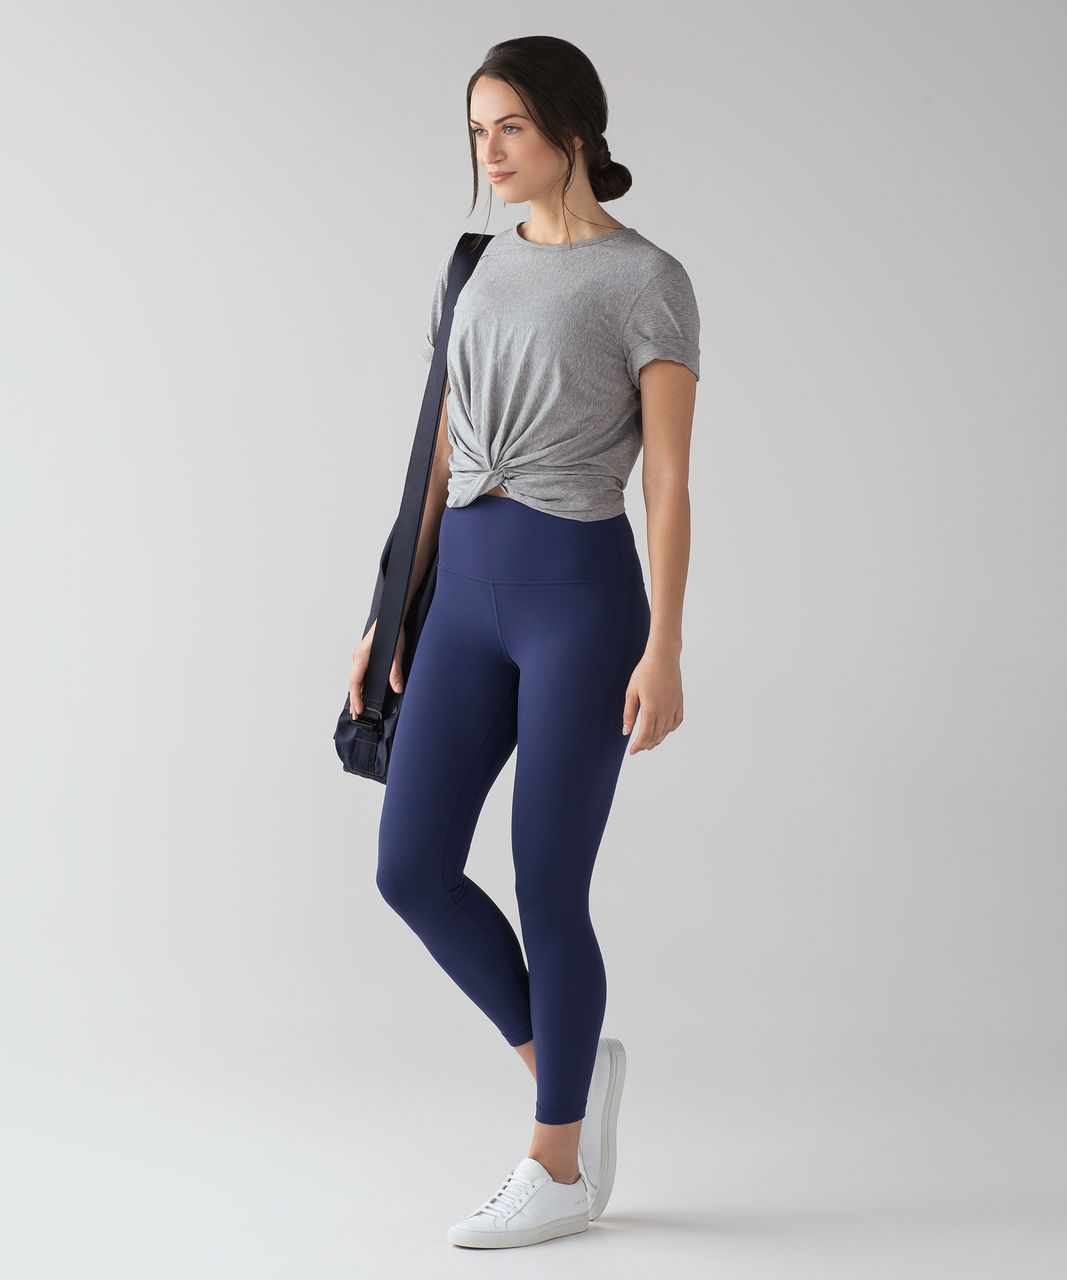 Lululemon Align Pant II - Blueberry Jam